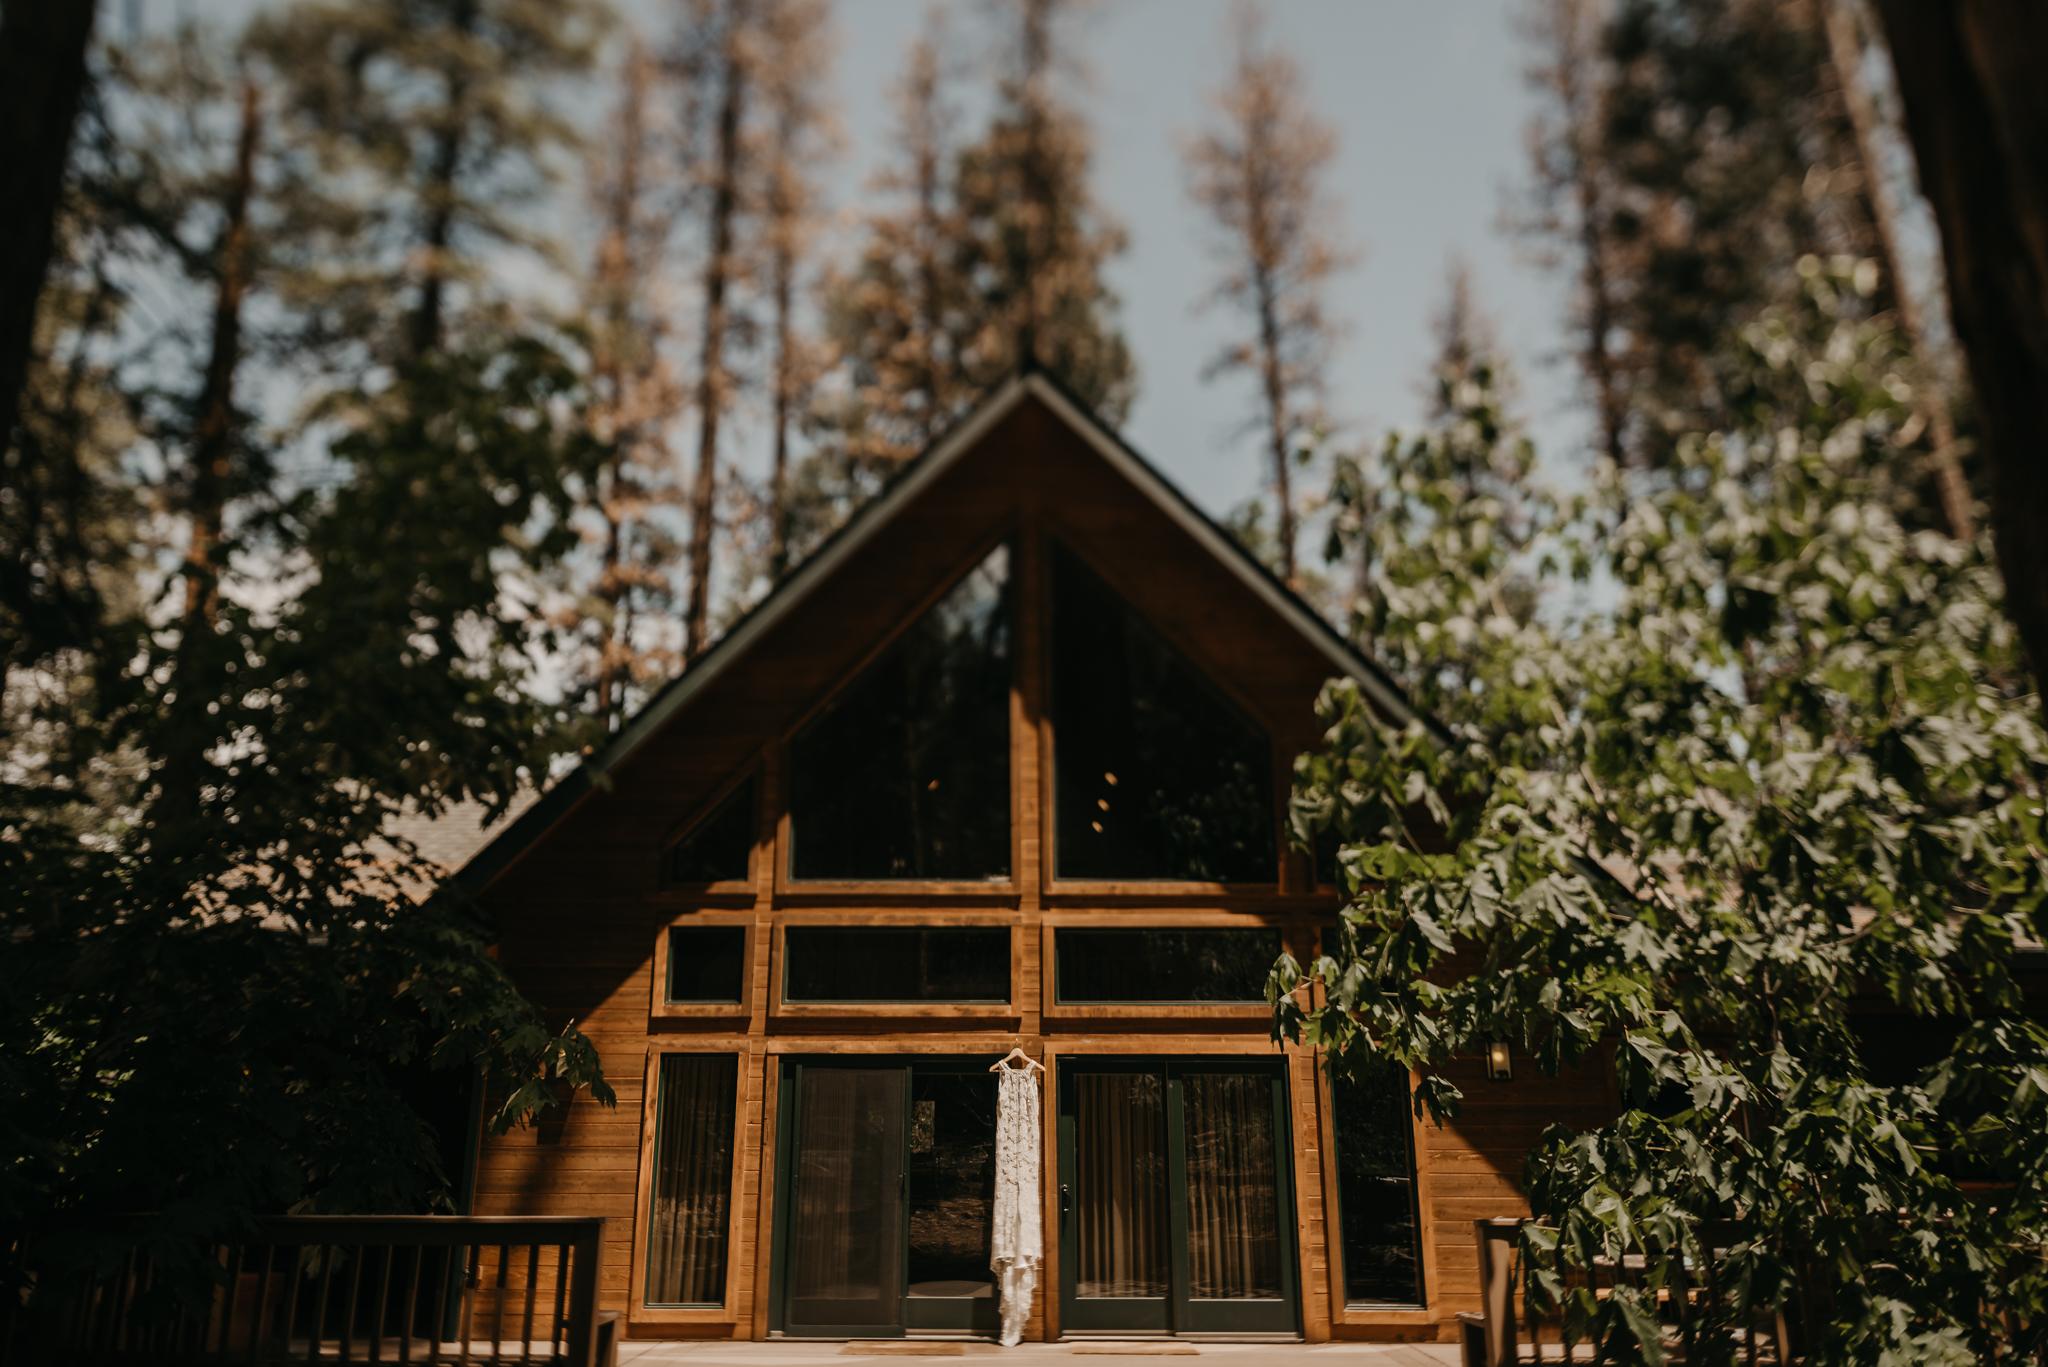 © Isaiah + Taylor Photography - Evergreen Lodge Destination Yoesmite Wedding - Los Angeles Wedding Photographer-016.jpg